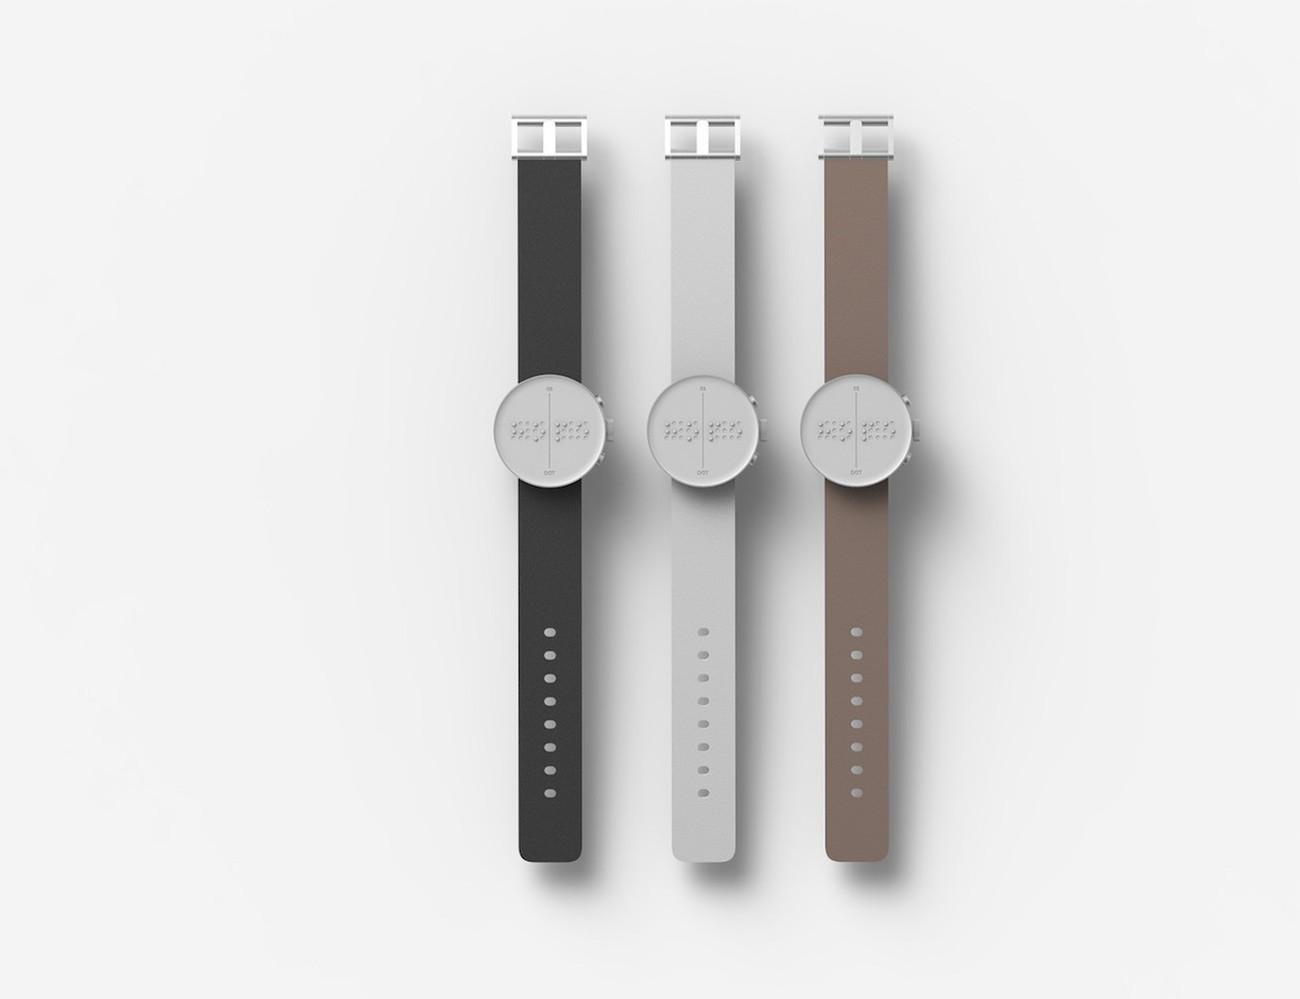 Dot Watch Braille Smartwatch Review » The Gadget Flow